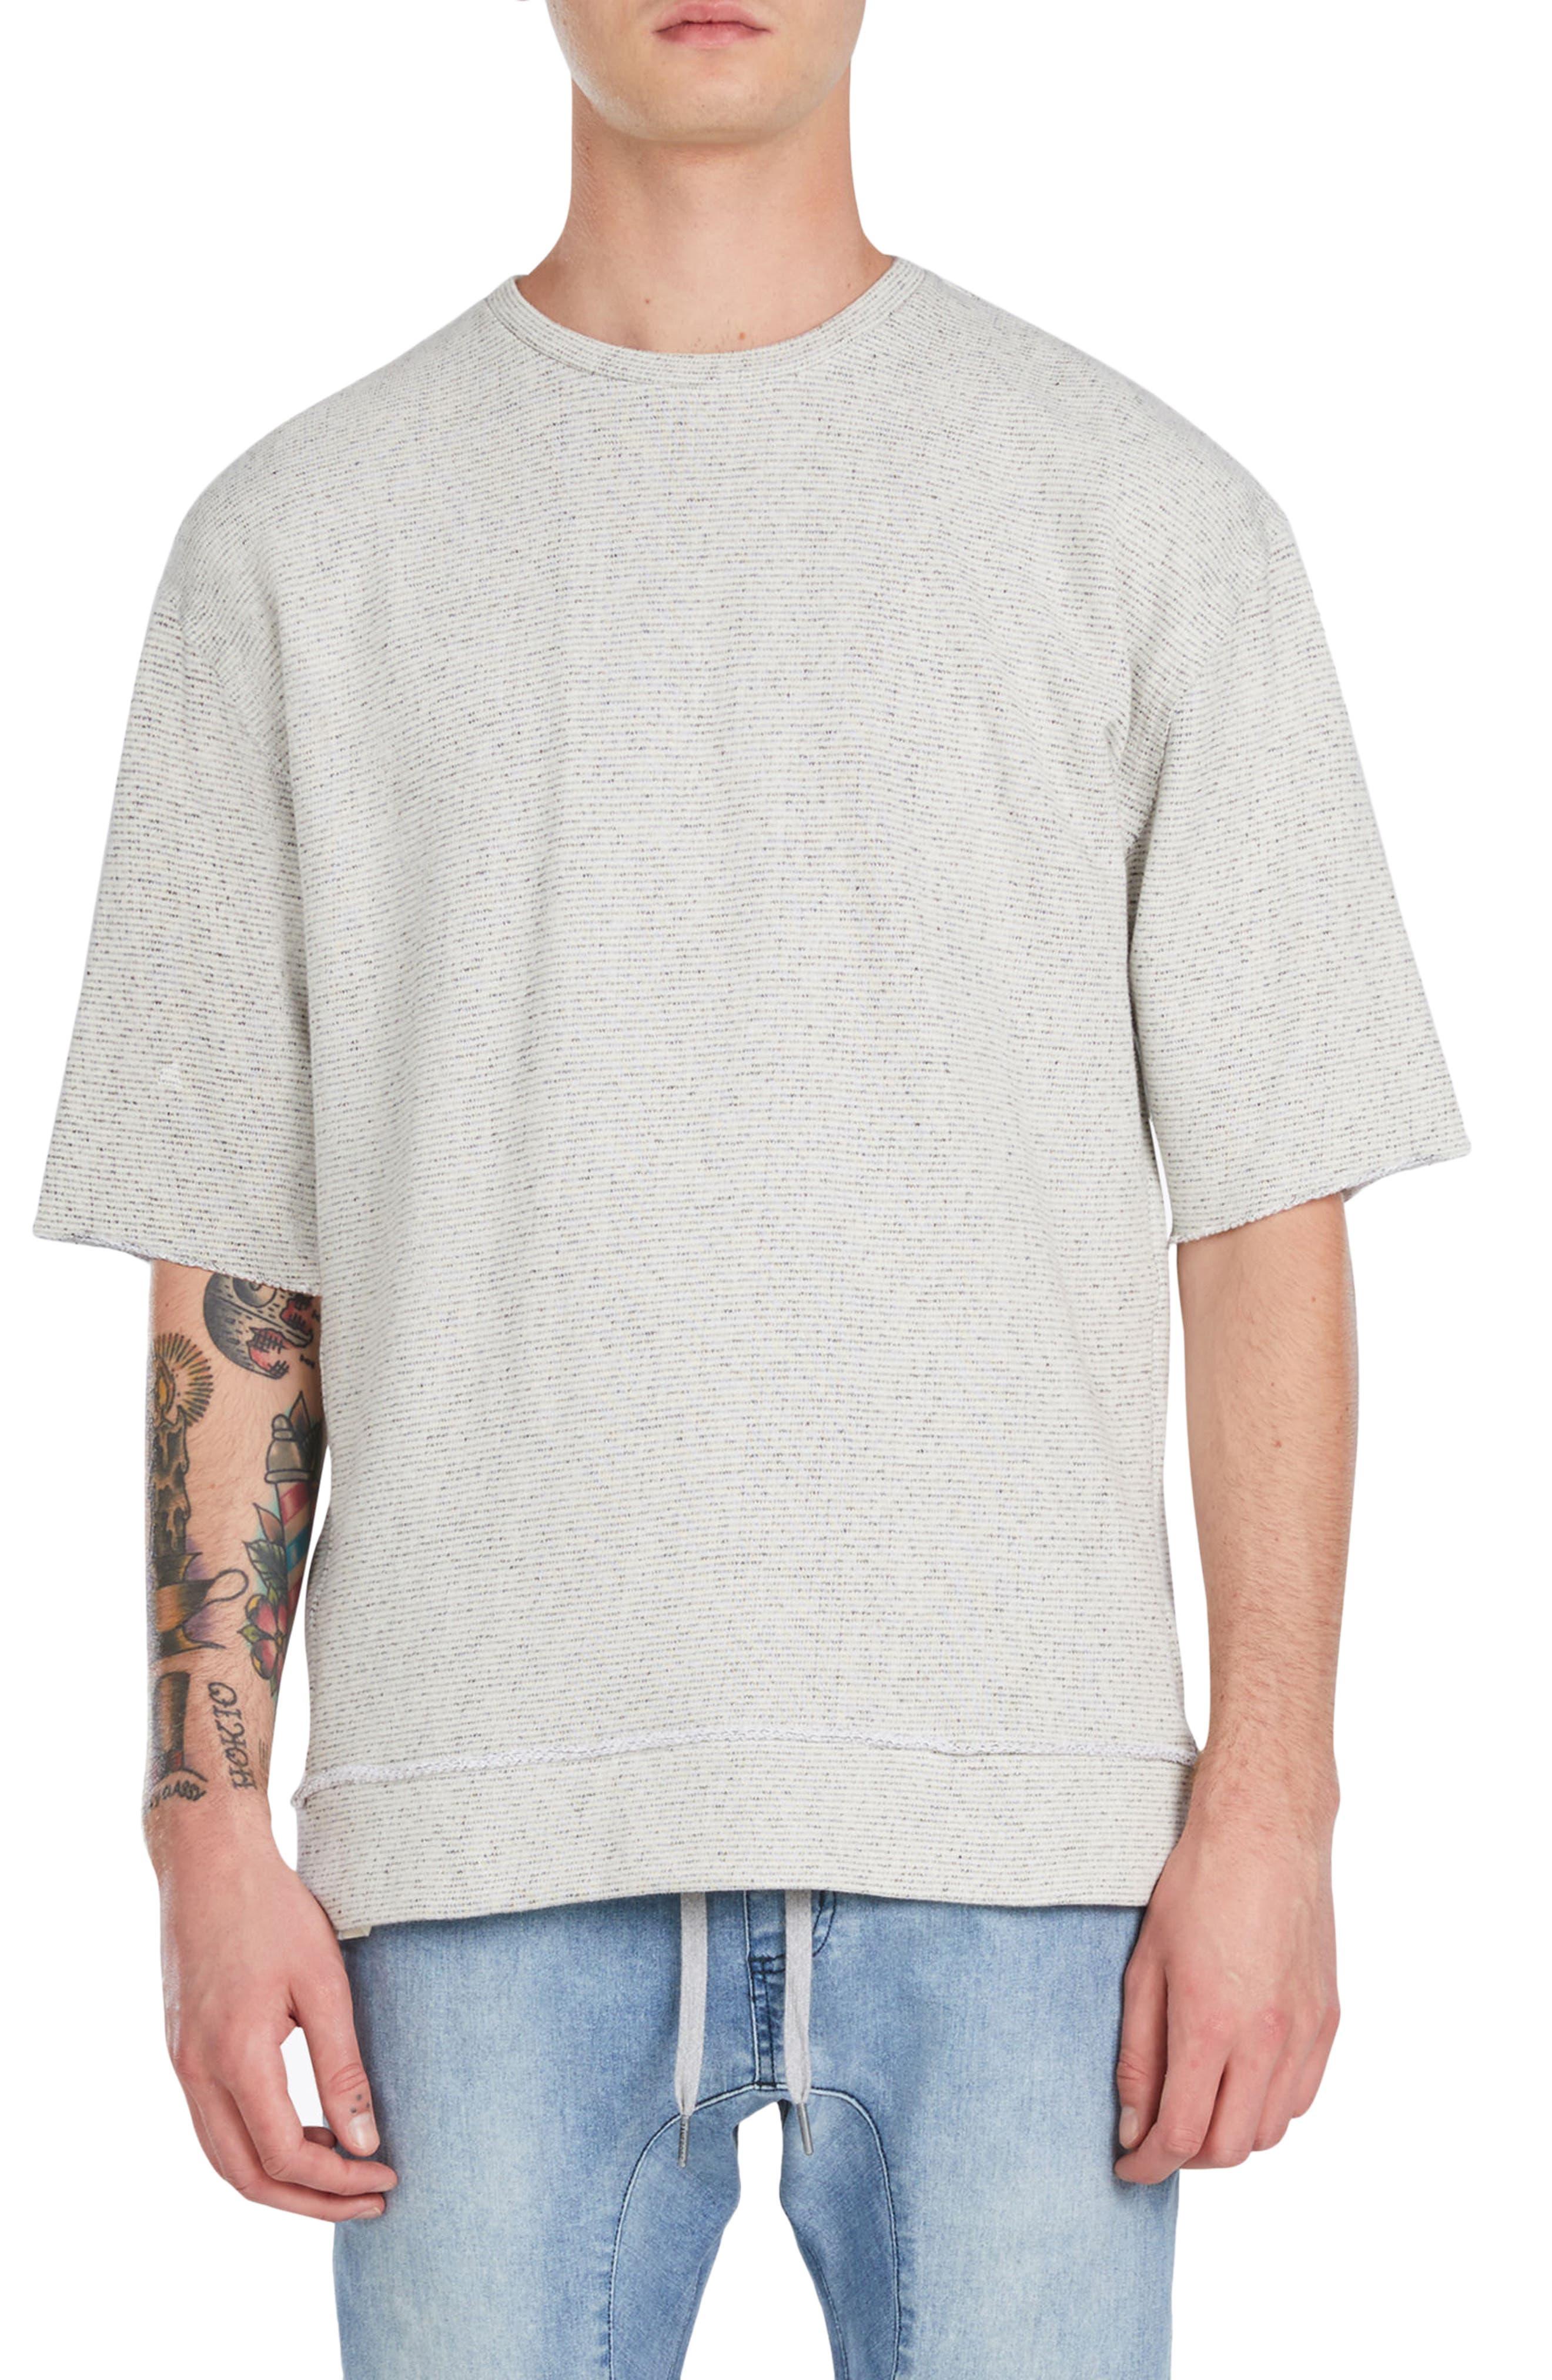 Rugger Oversize Half Sleeve Sweatshirt,                         Main,                         color, 251